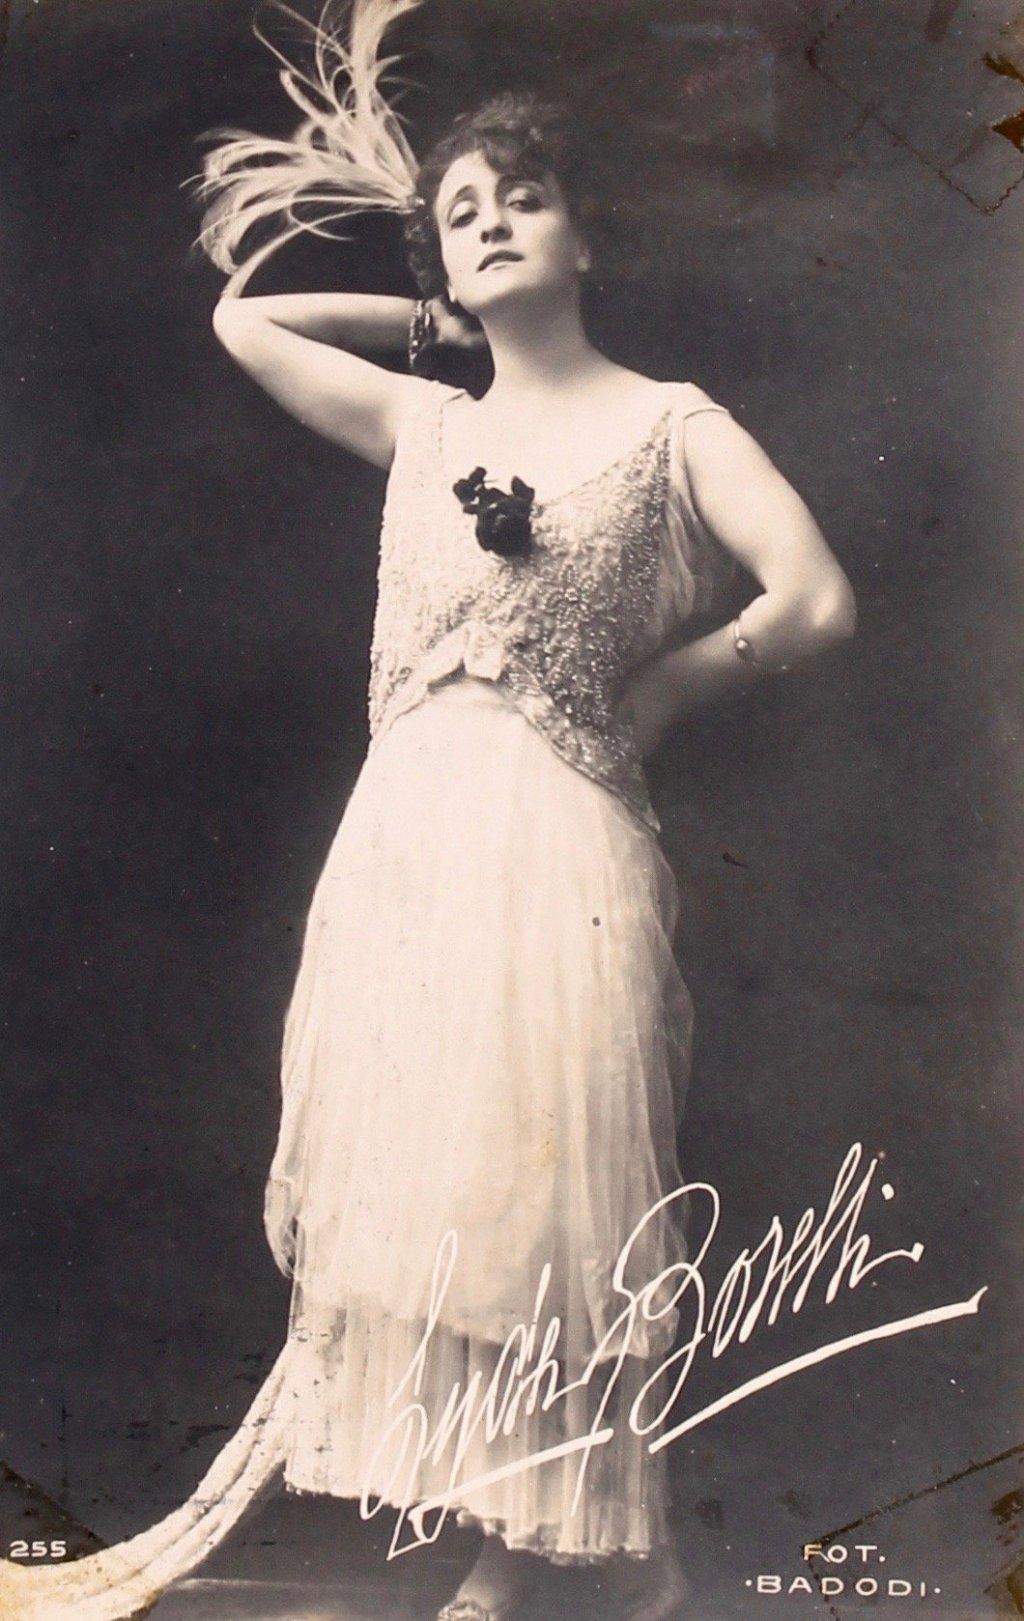 Lydia Borelli